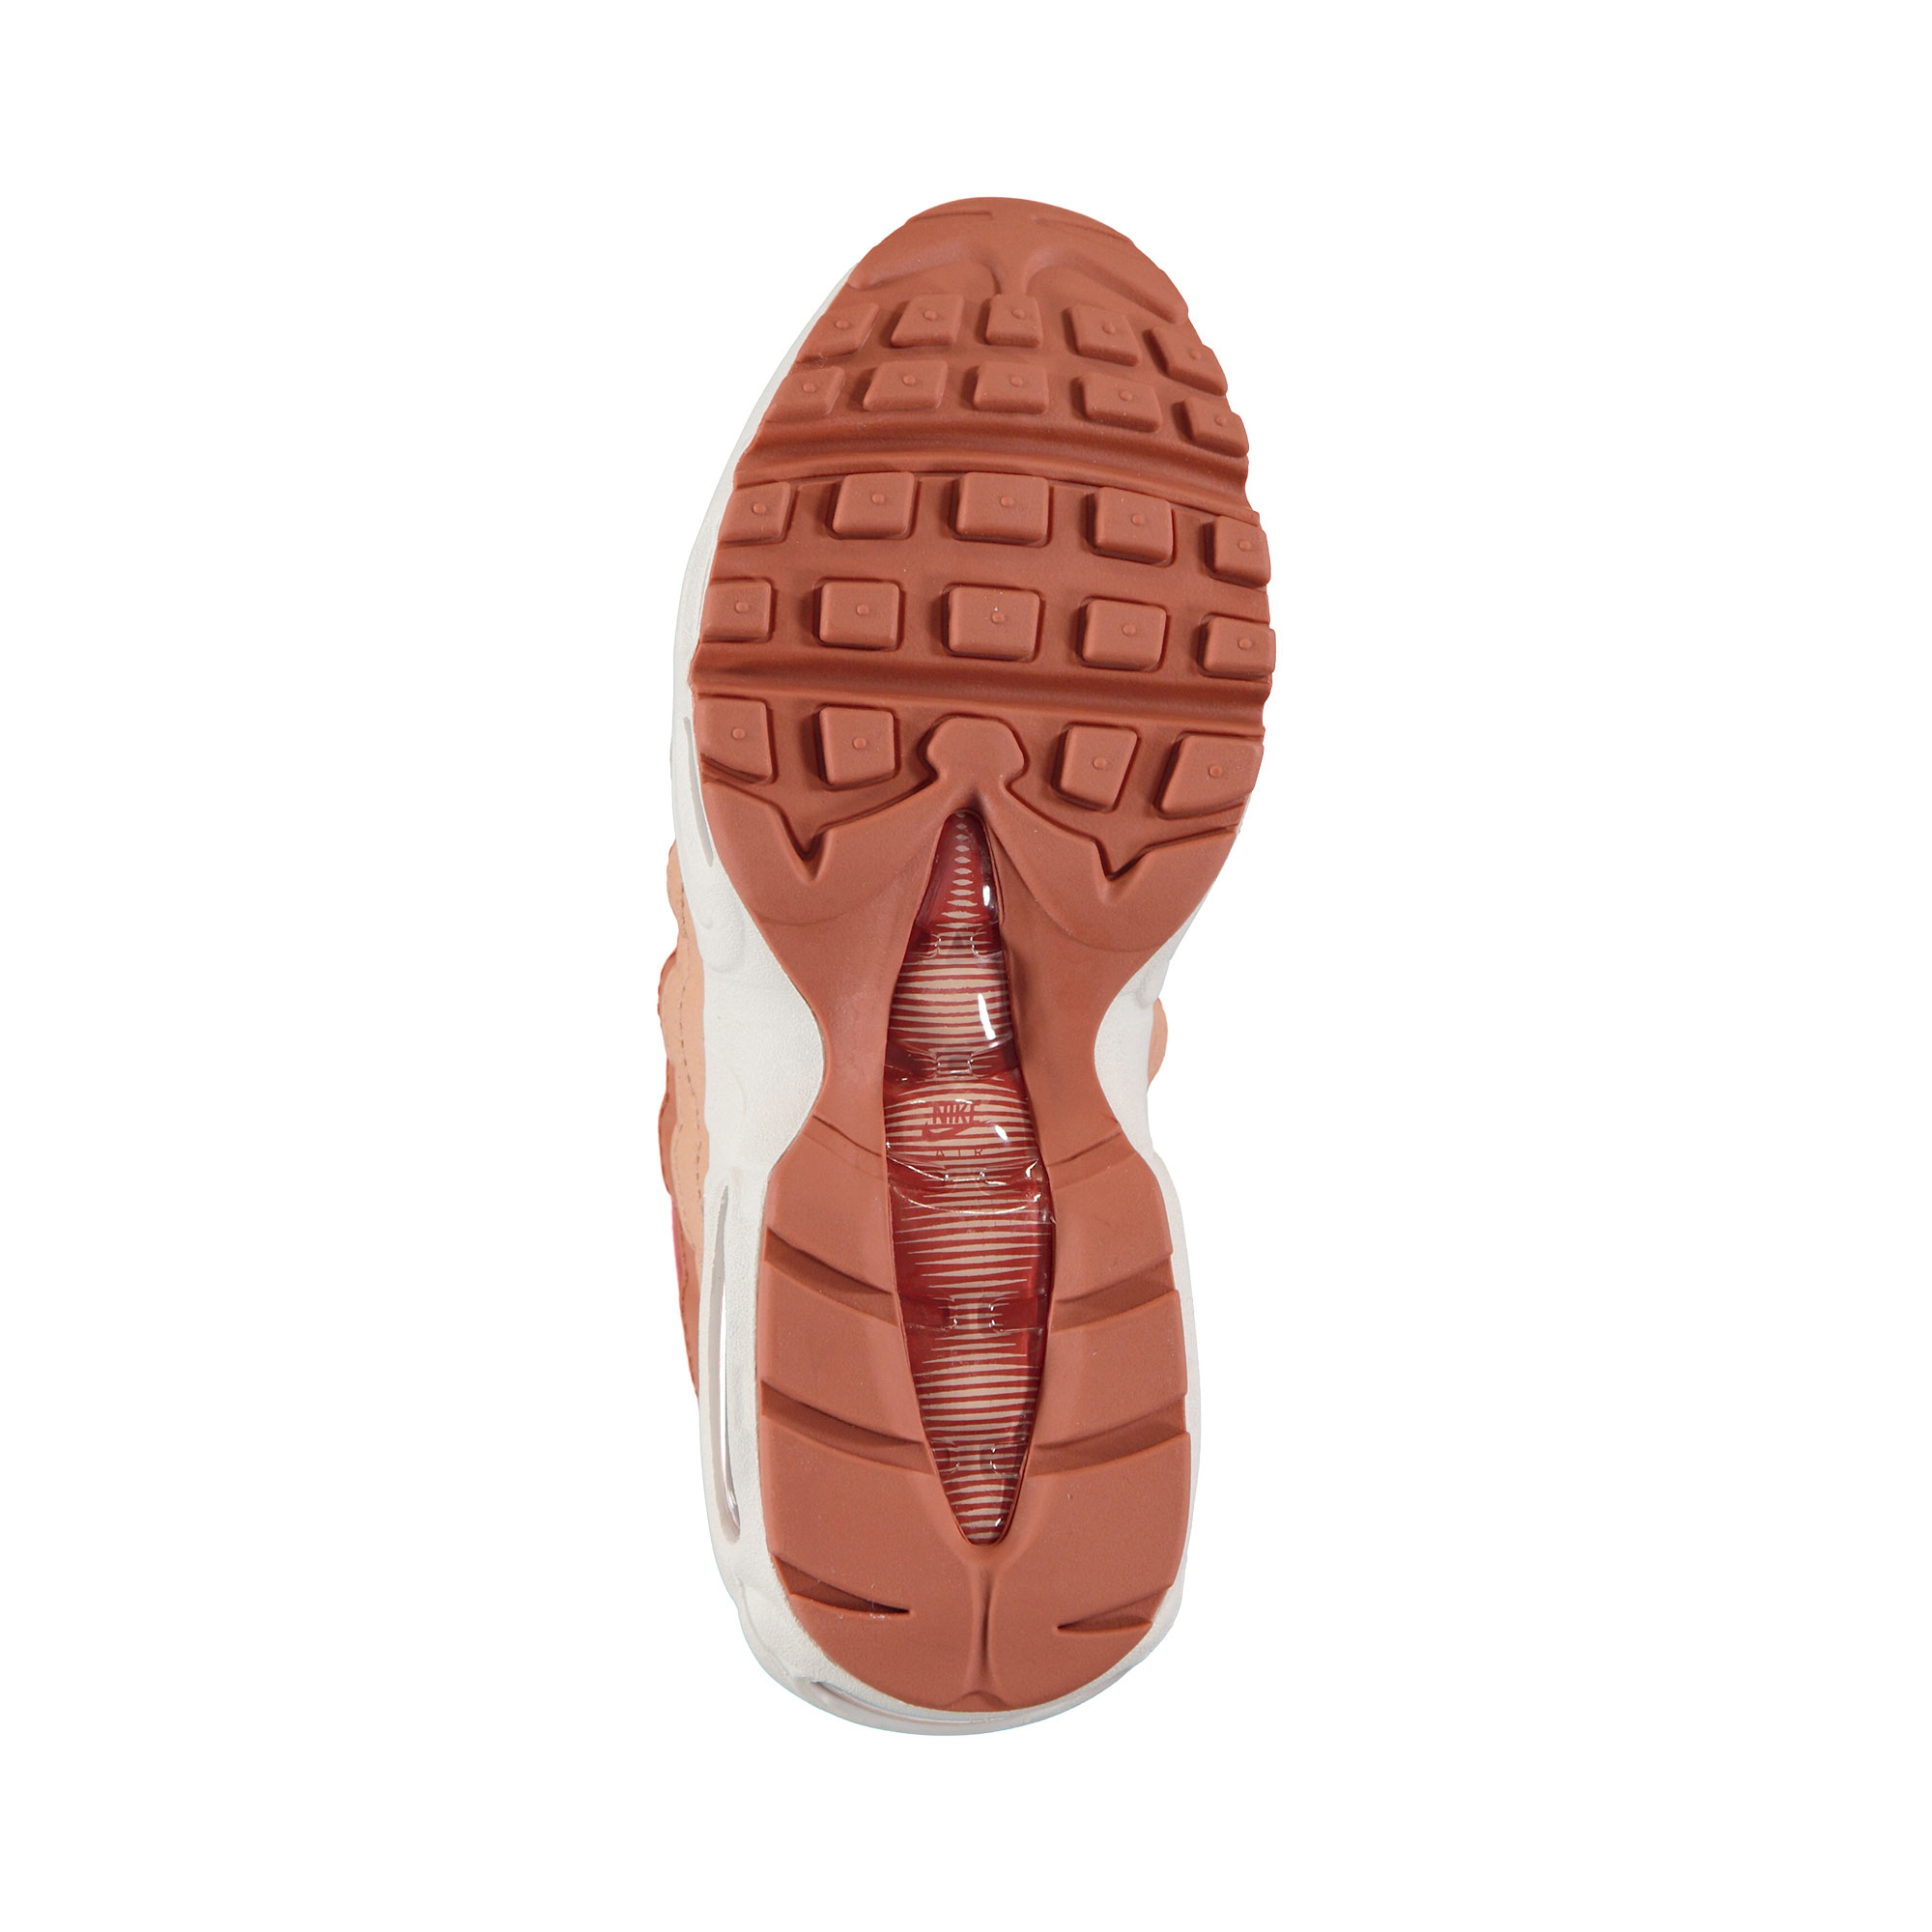 Nike Wmns Air Max 95 Kadın Kırmızı Spor Ayakkabı